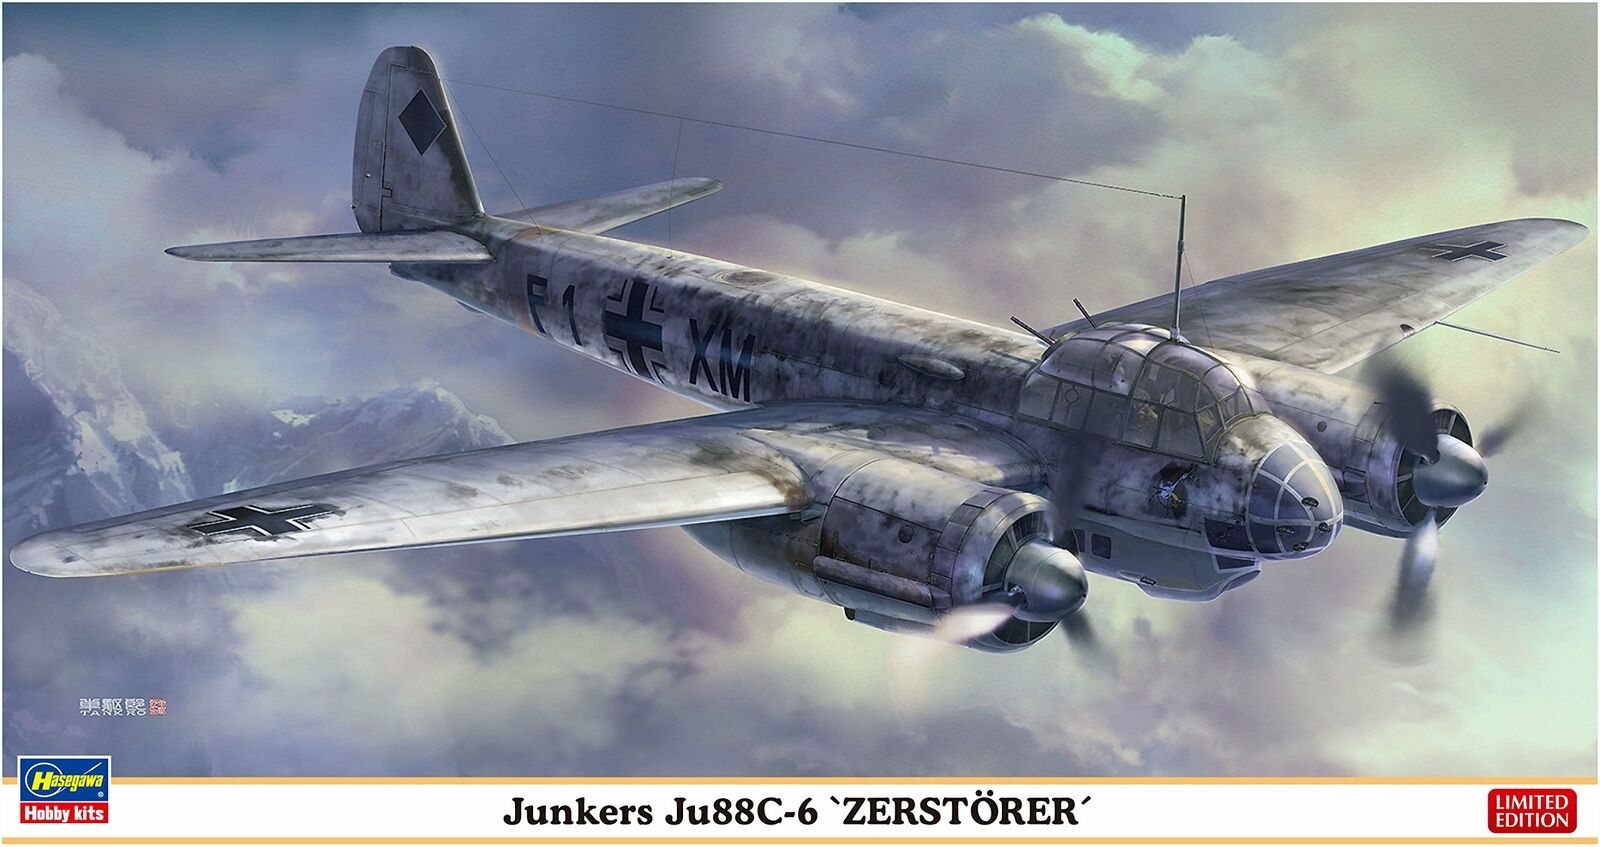 Hasegawa 1 72 Junkers Ju88C-6 Zerstorer Model Kit NEW from Japan F S